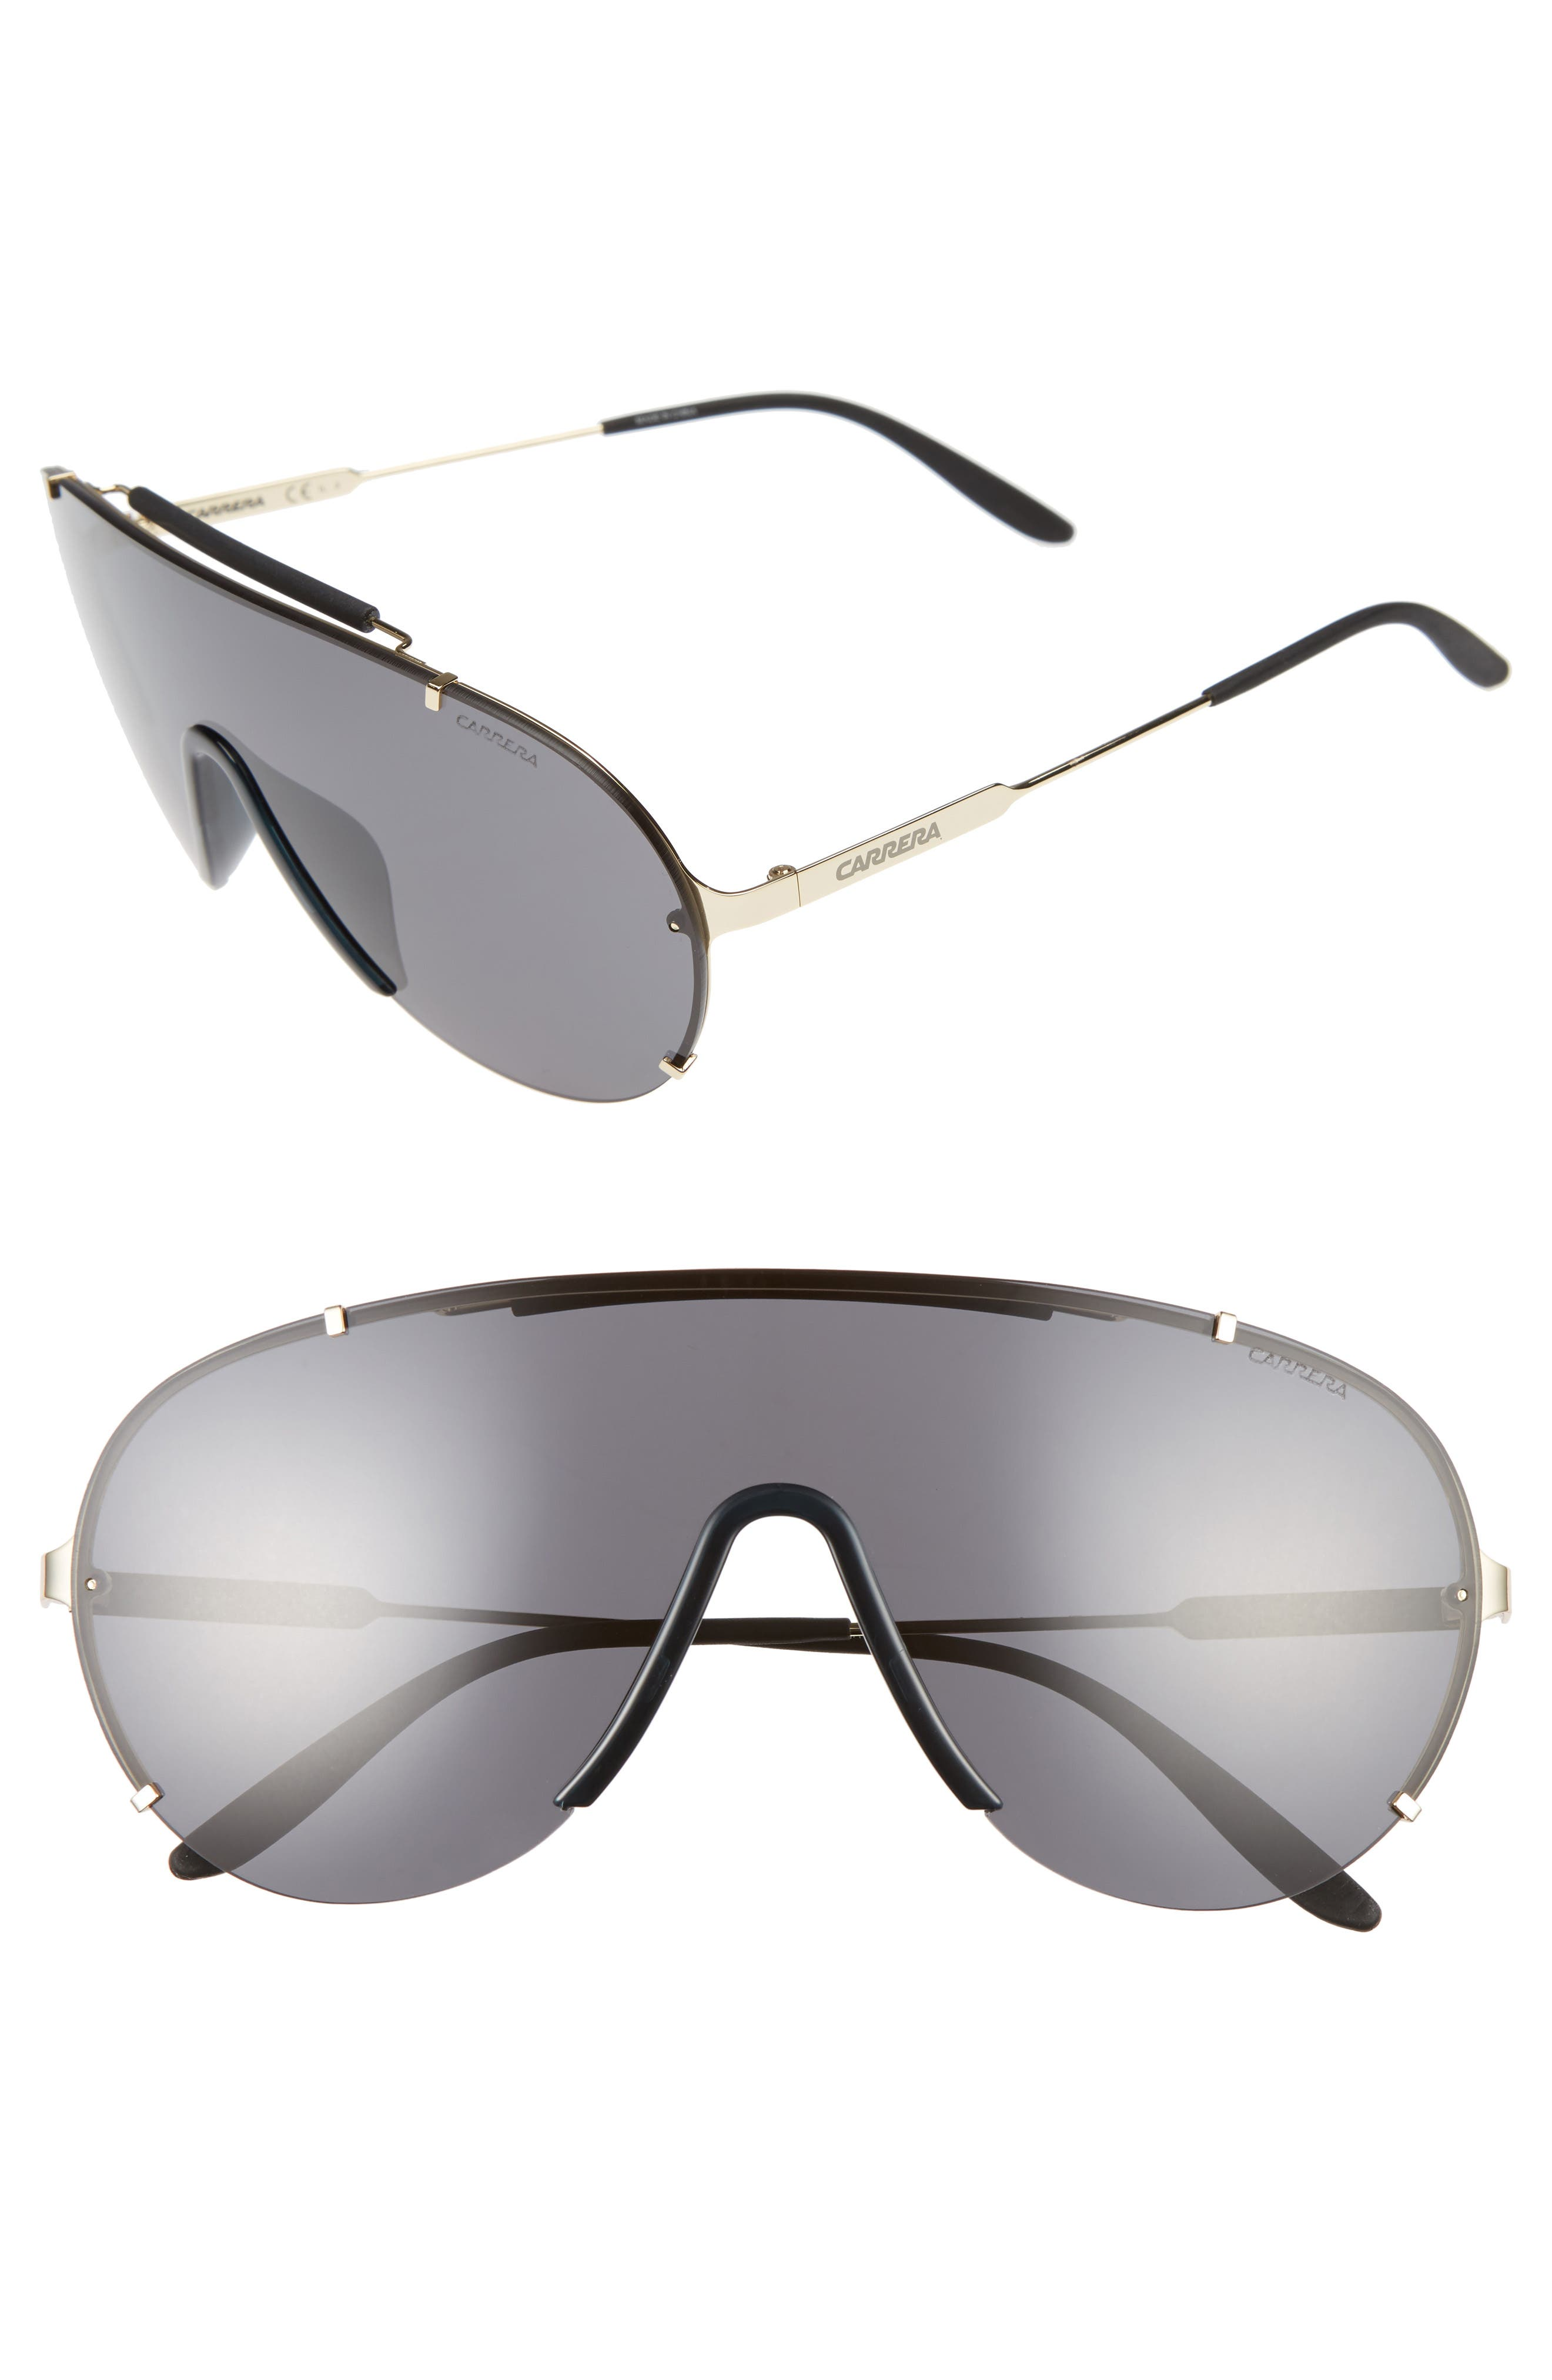 99mm Sunglasses,                             Alternate thumbnail 2, color,